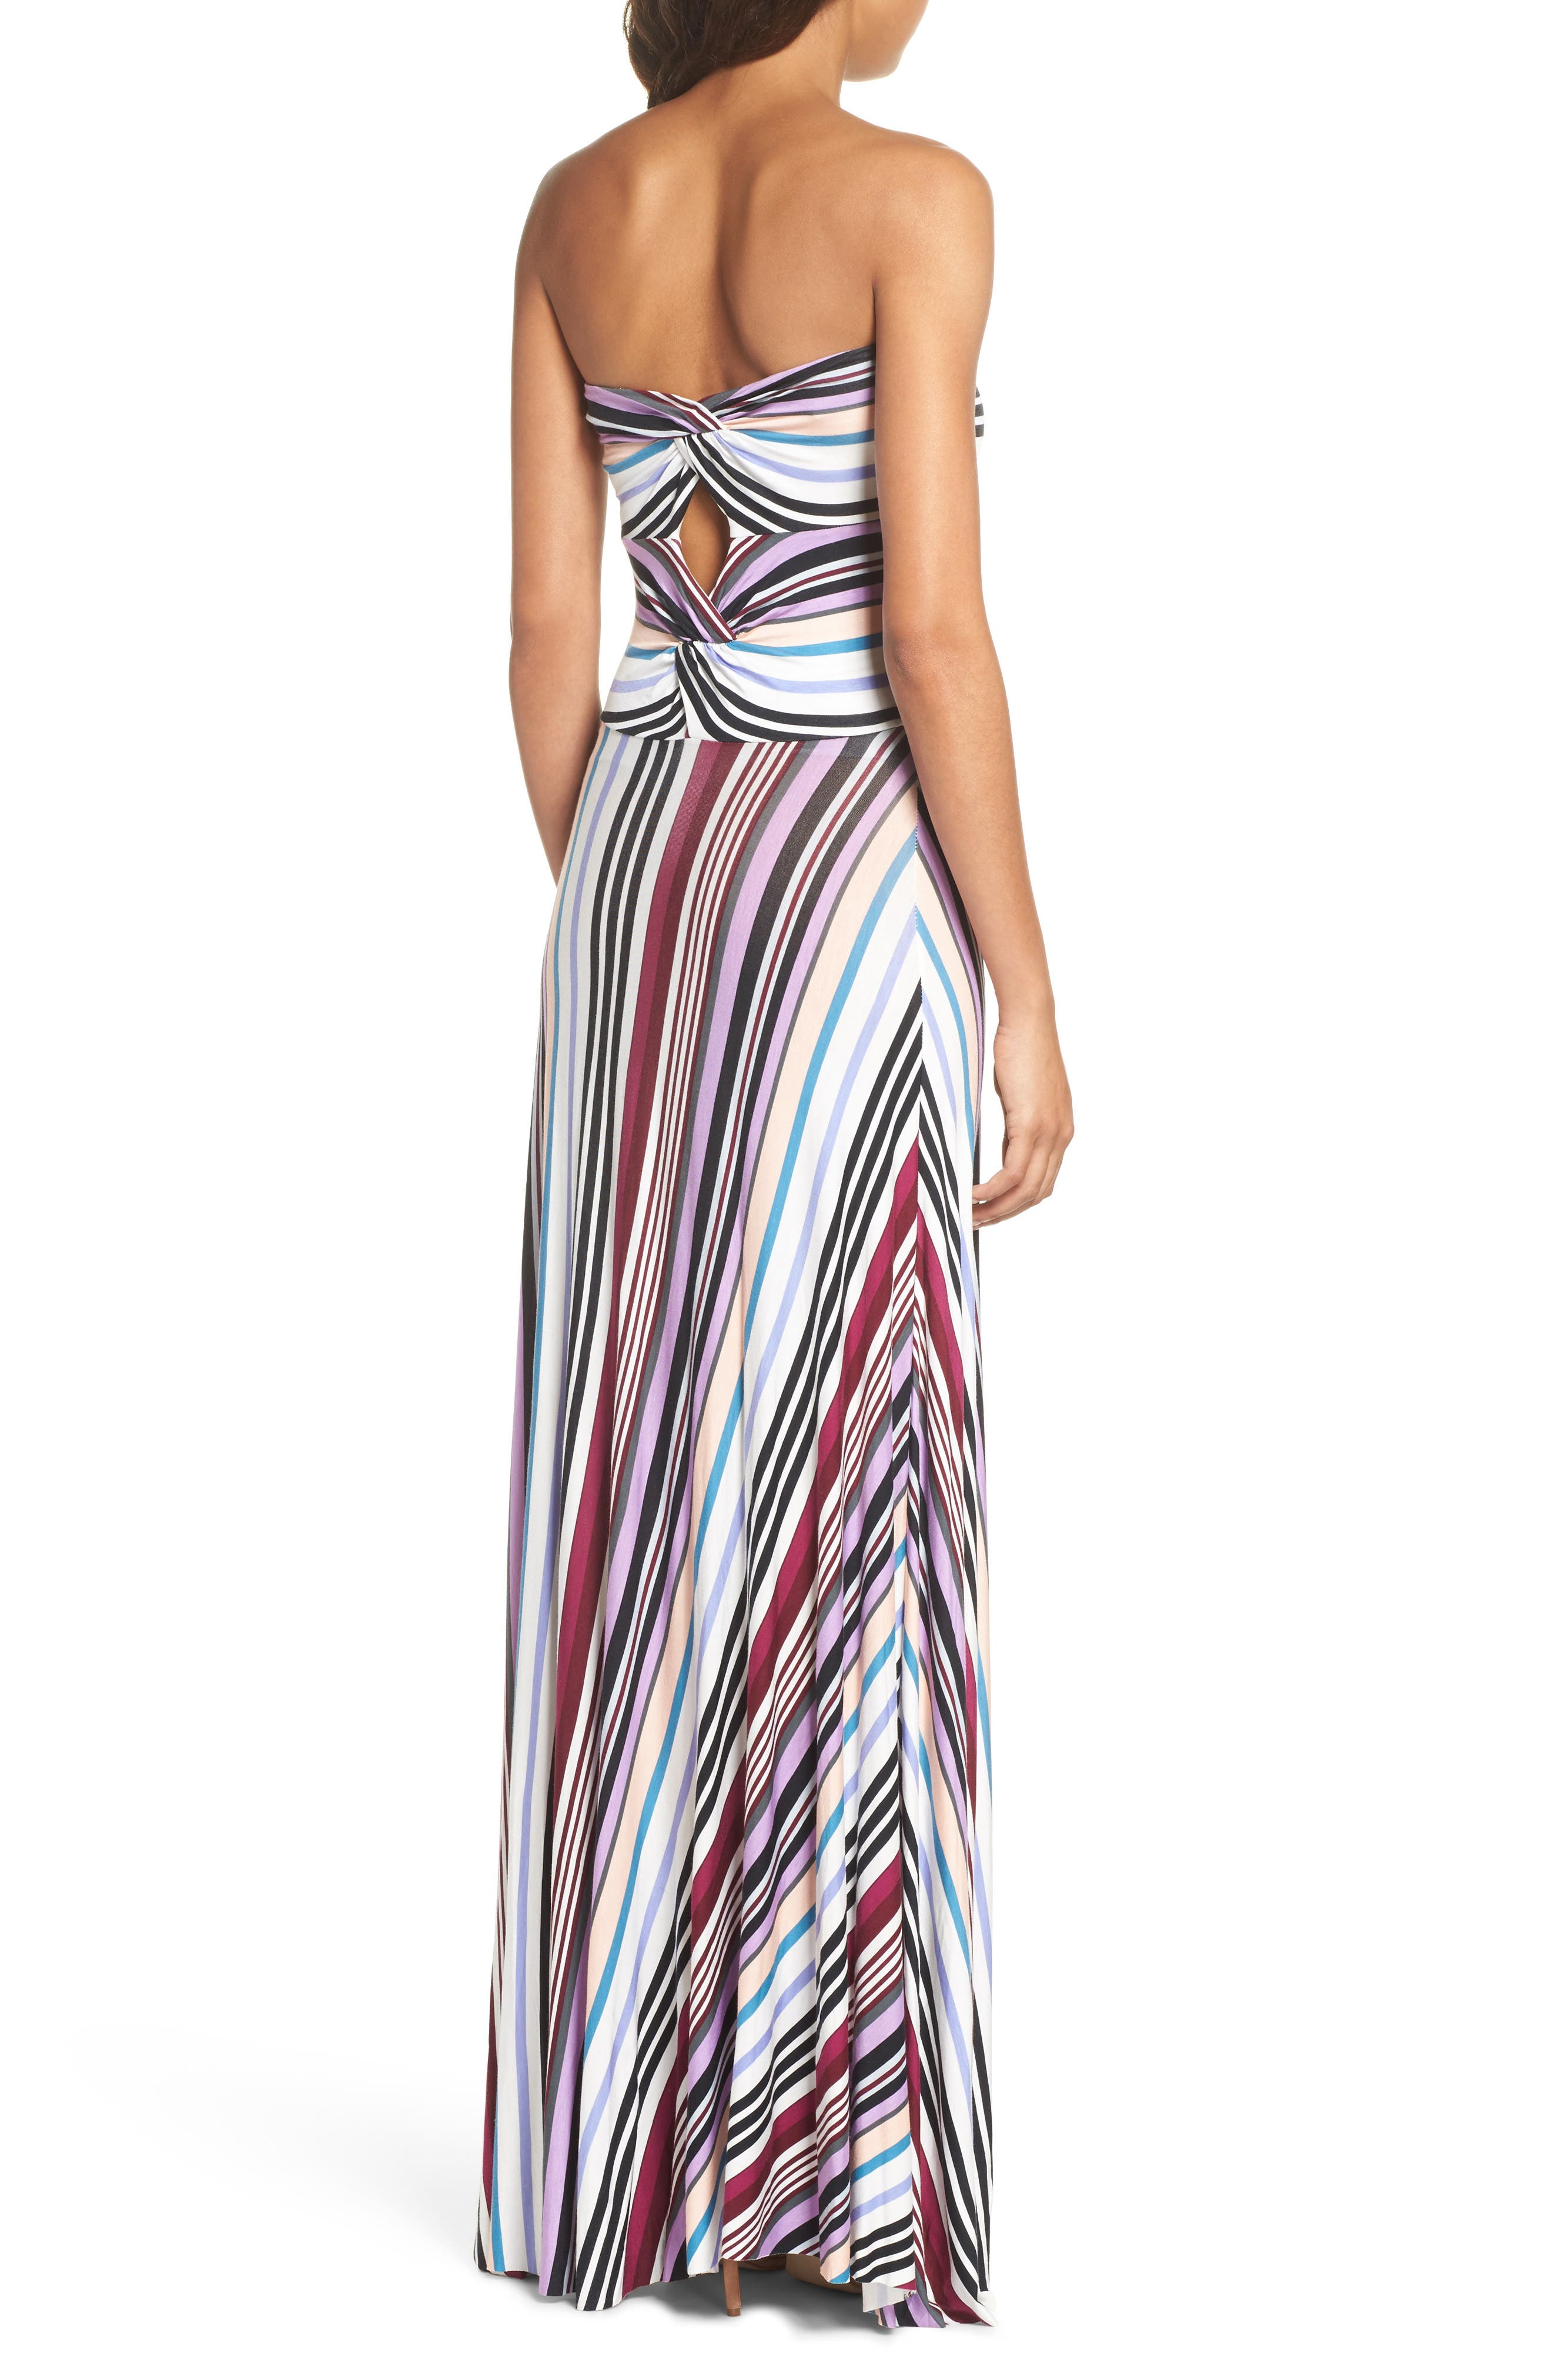 Clemette Strapless Maxi Dress,                             Alternate thumbnail 2, color,                             Purple Multi Stripe